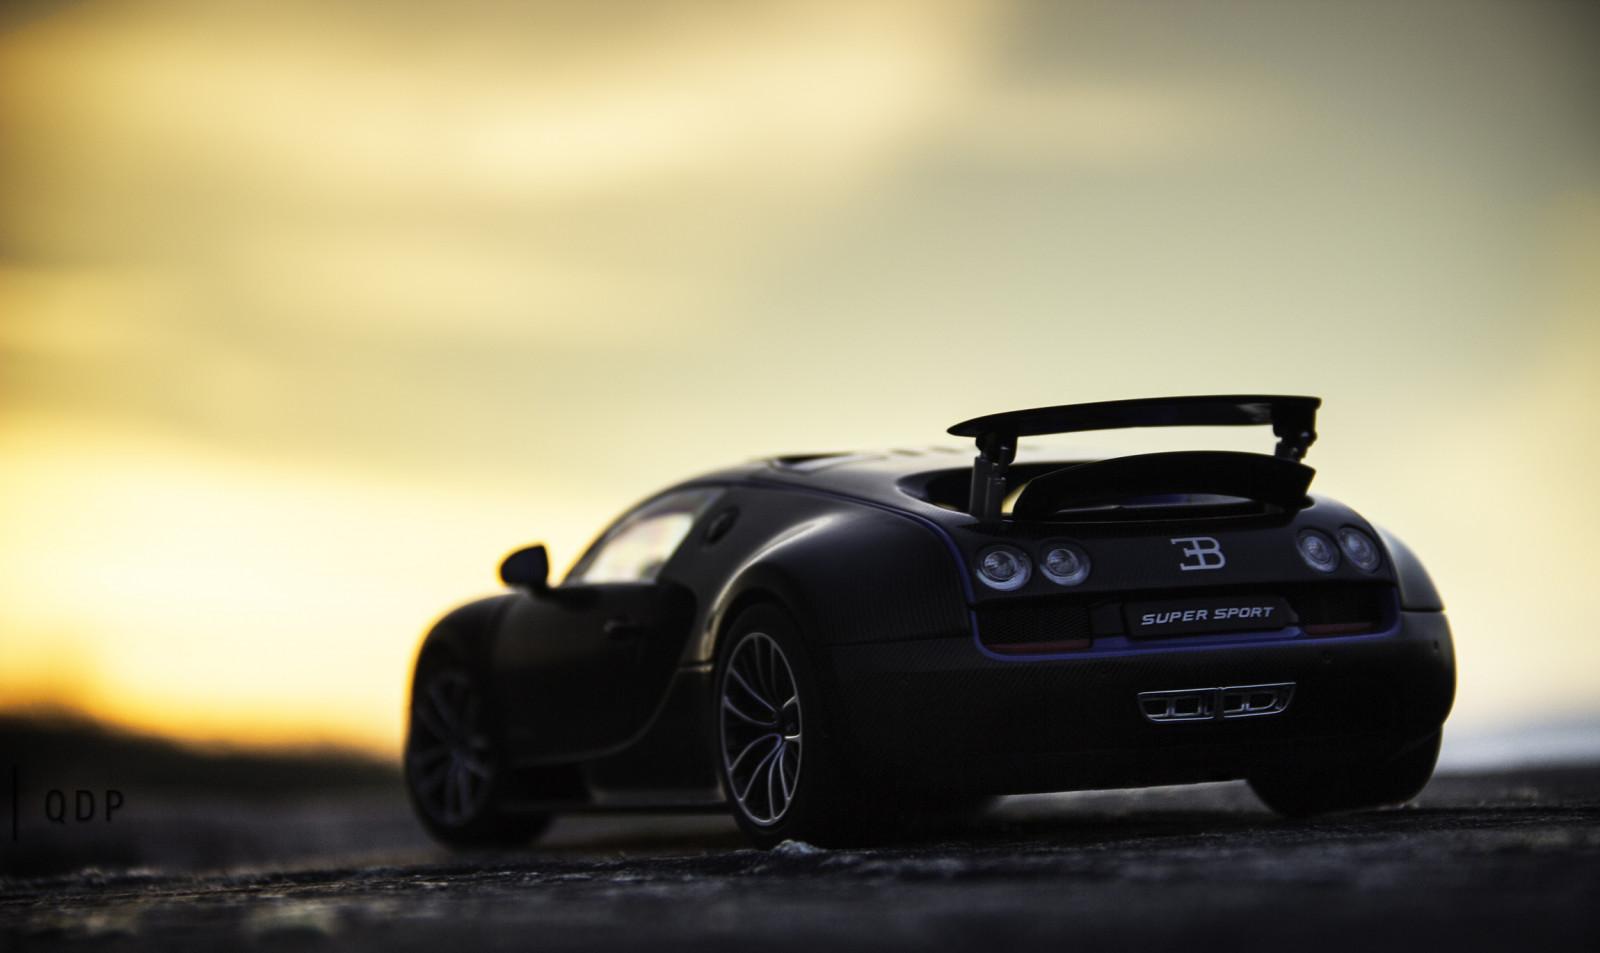 wallpaper sunset supercars blue paris sports car money bugatti veyron performance car. Black Bedroom Furniture Sets. Home Design Ideas